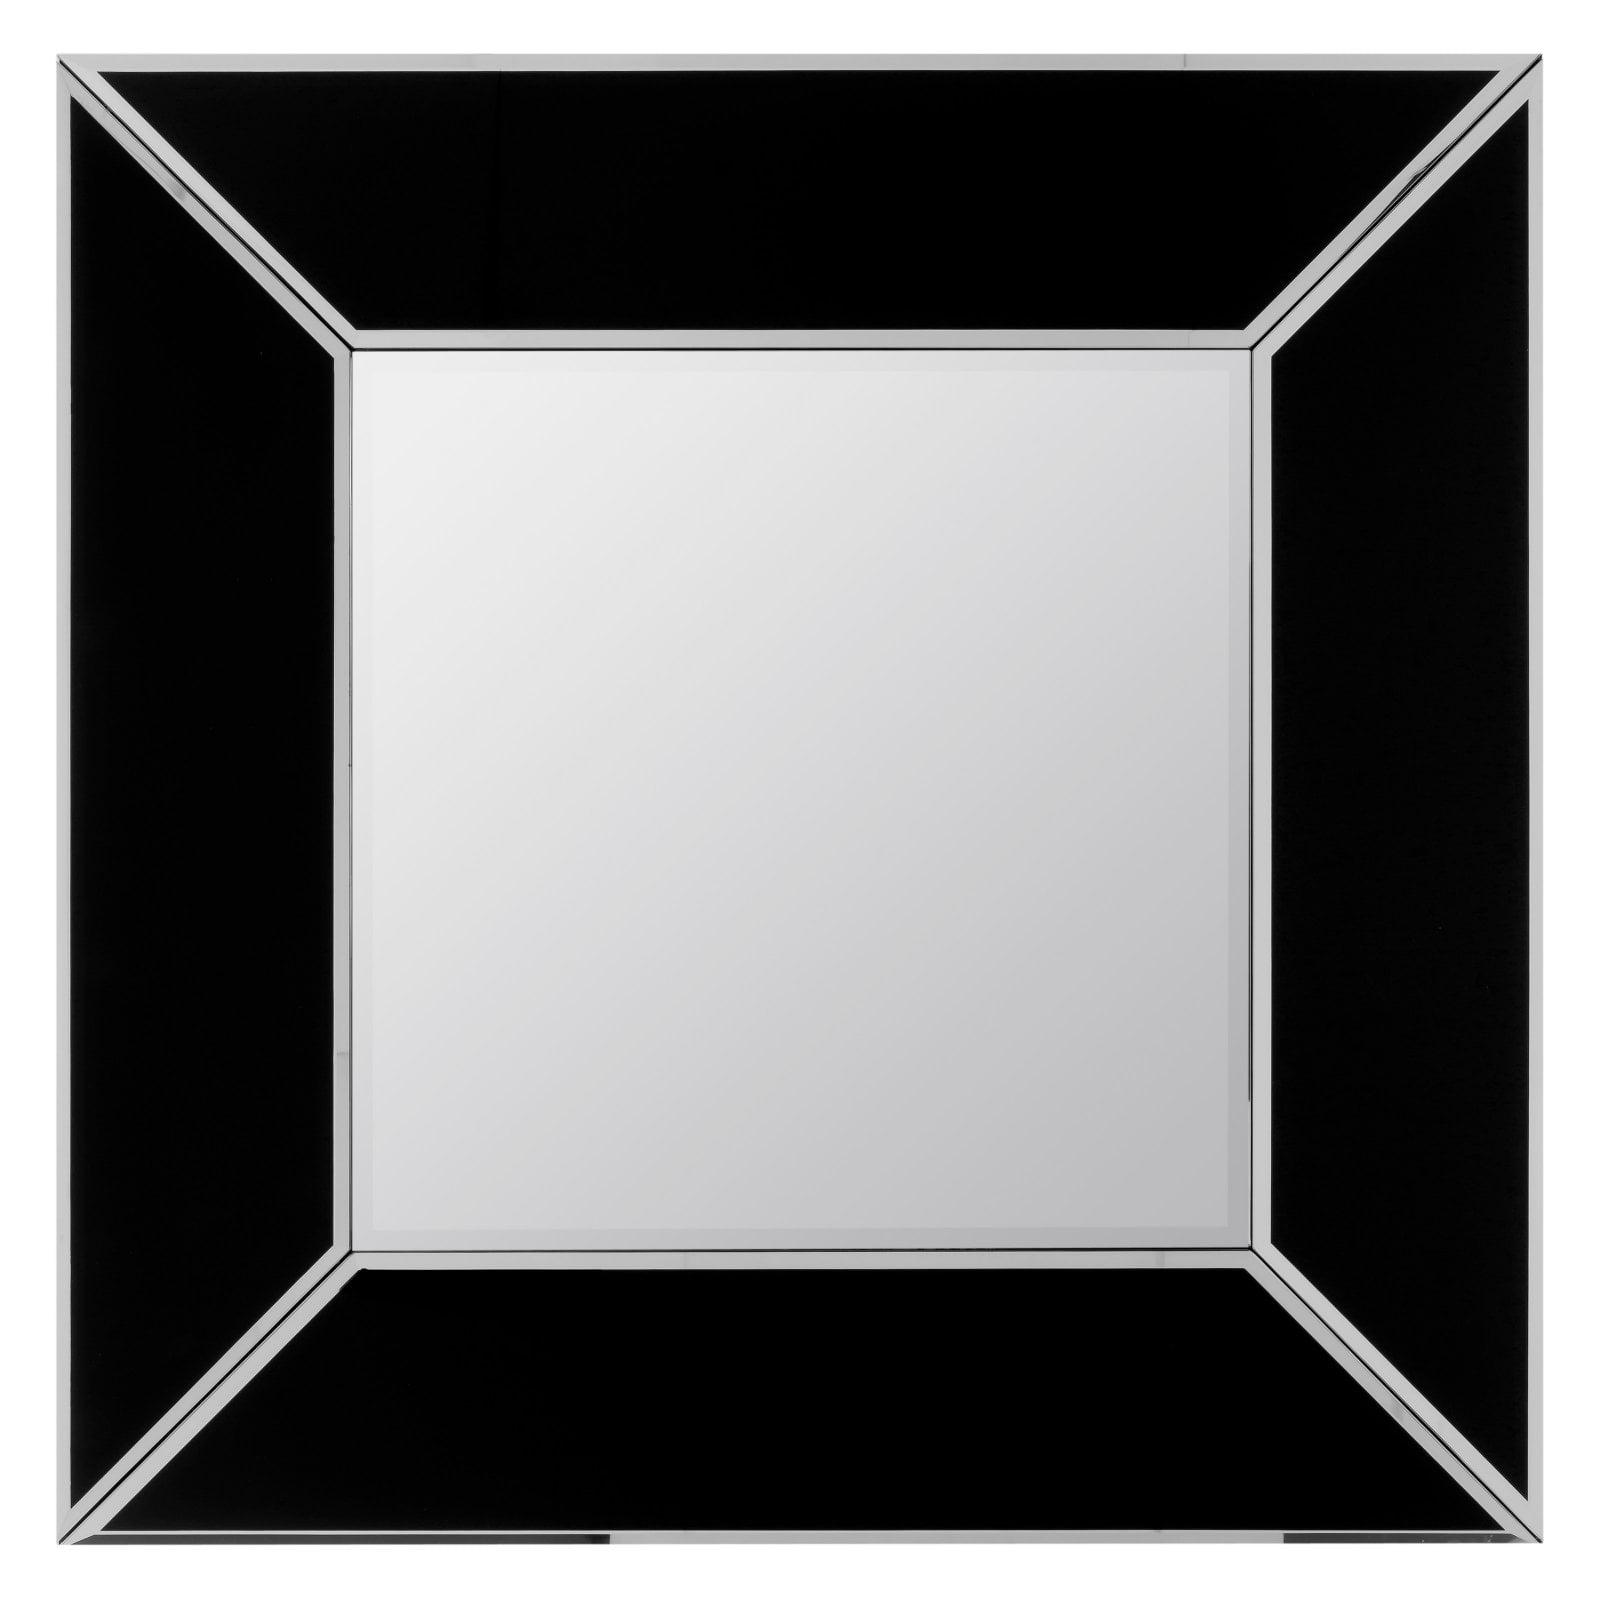 Cooper Classics Rushford Wall Mirror - 40W x 40H in.